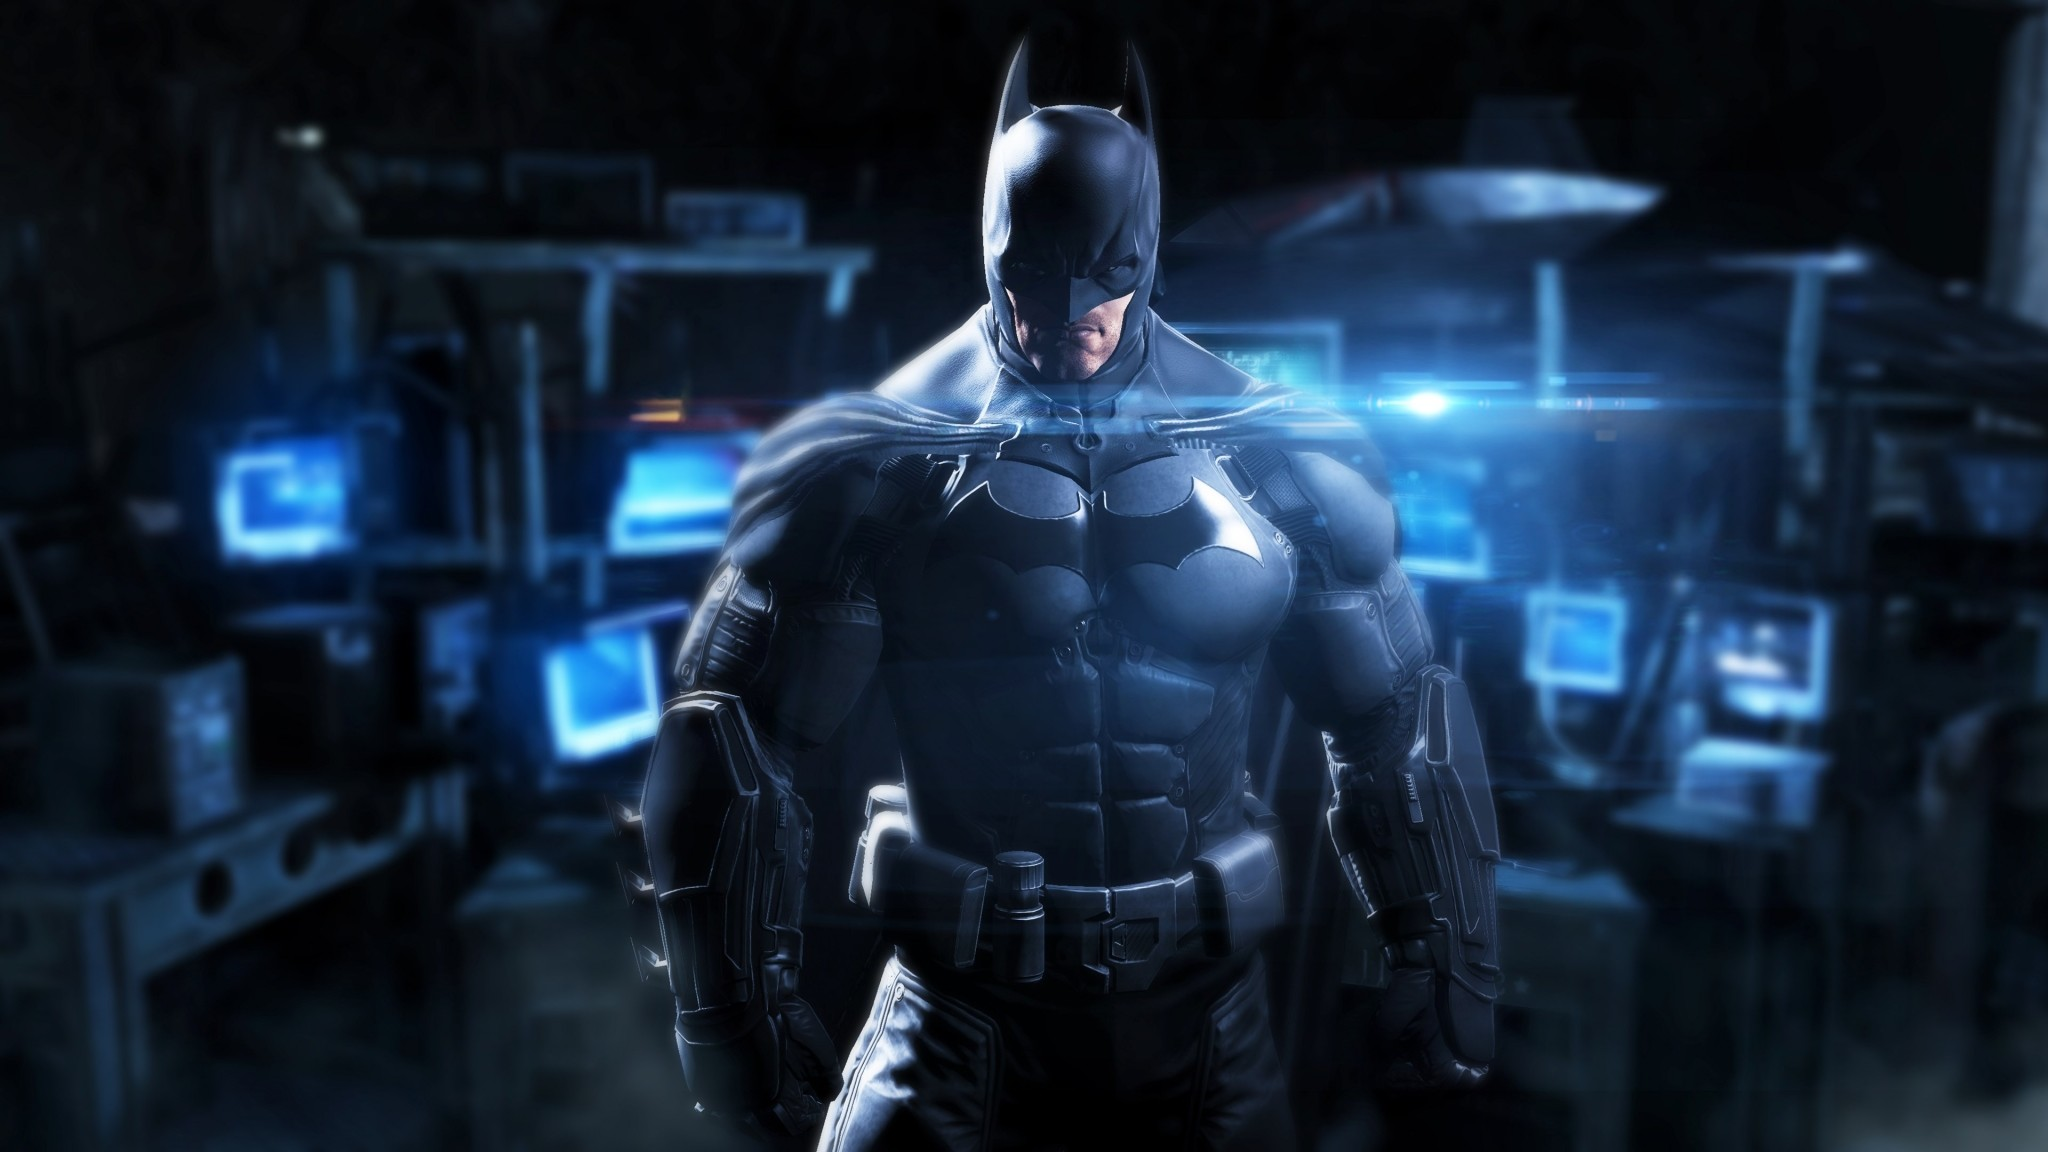 batman wallpaper and screensaver (79+ images)